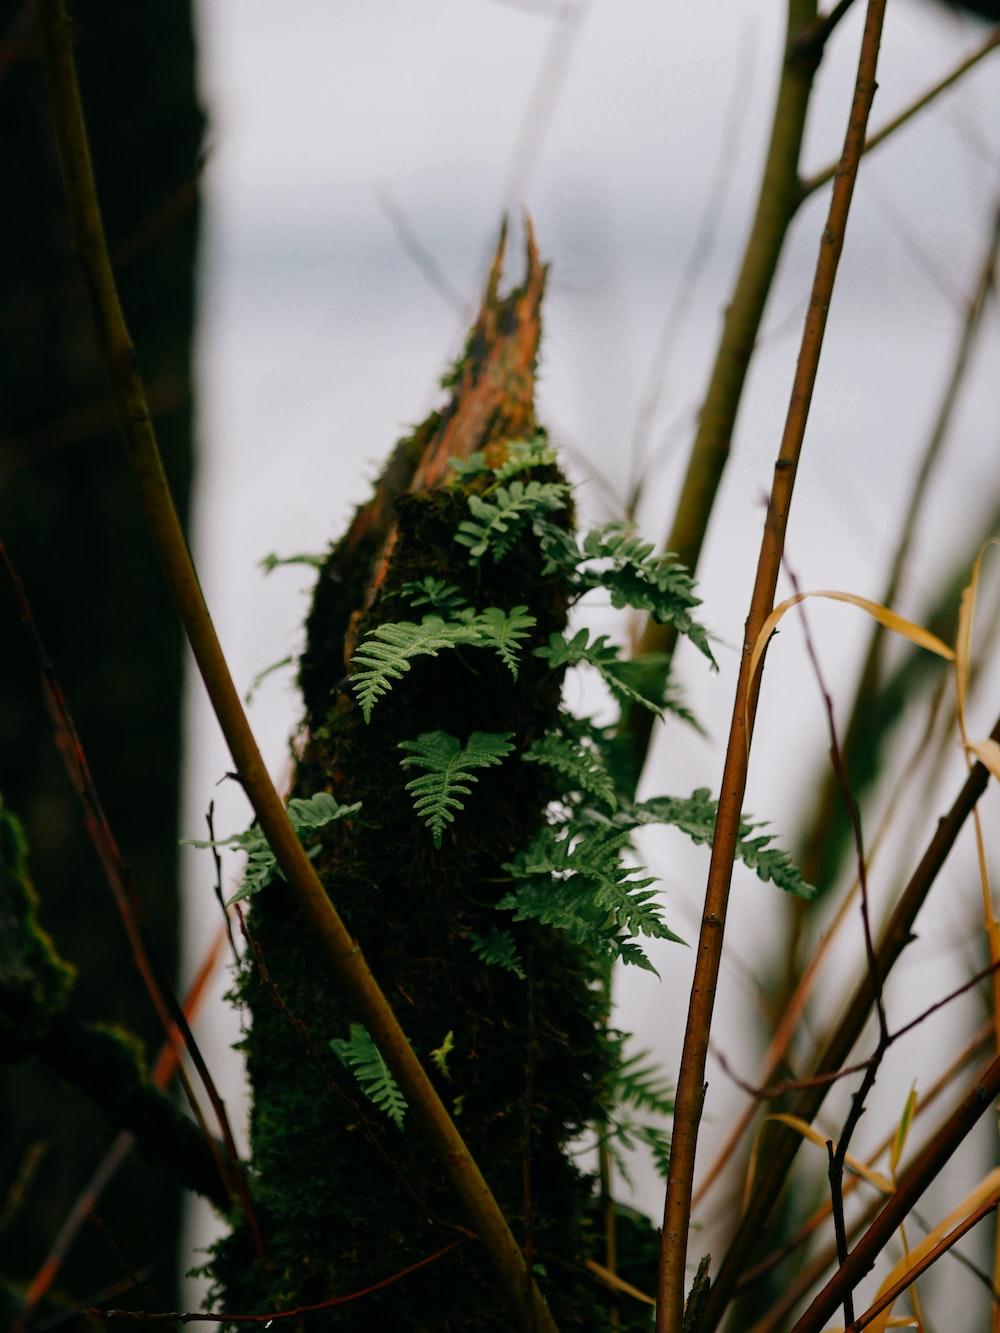 green ferns during daytime